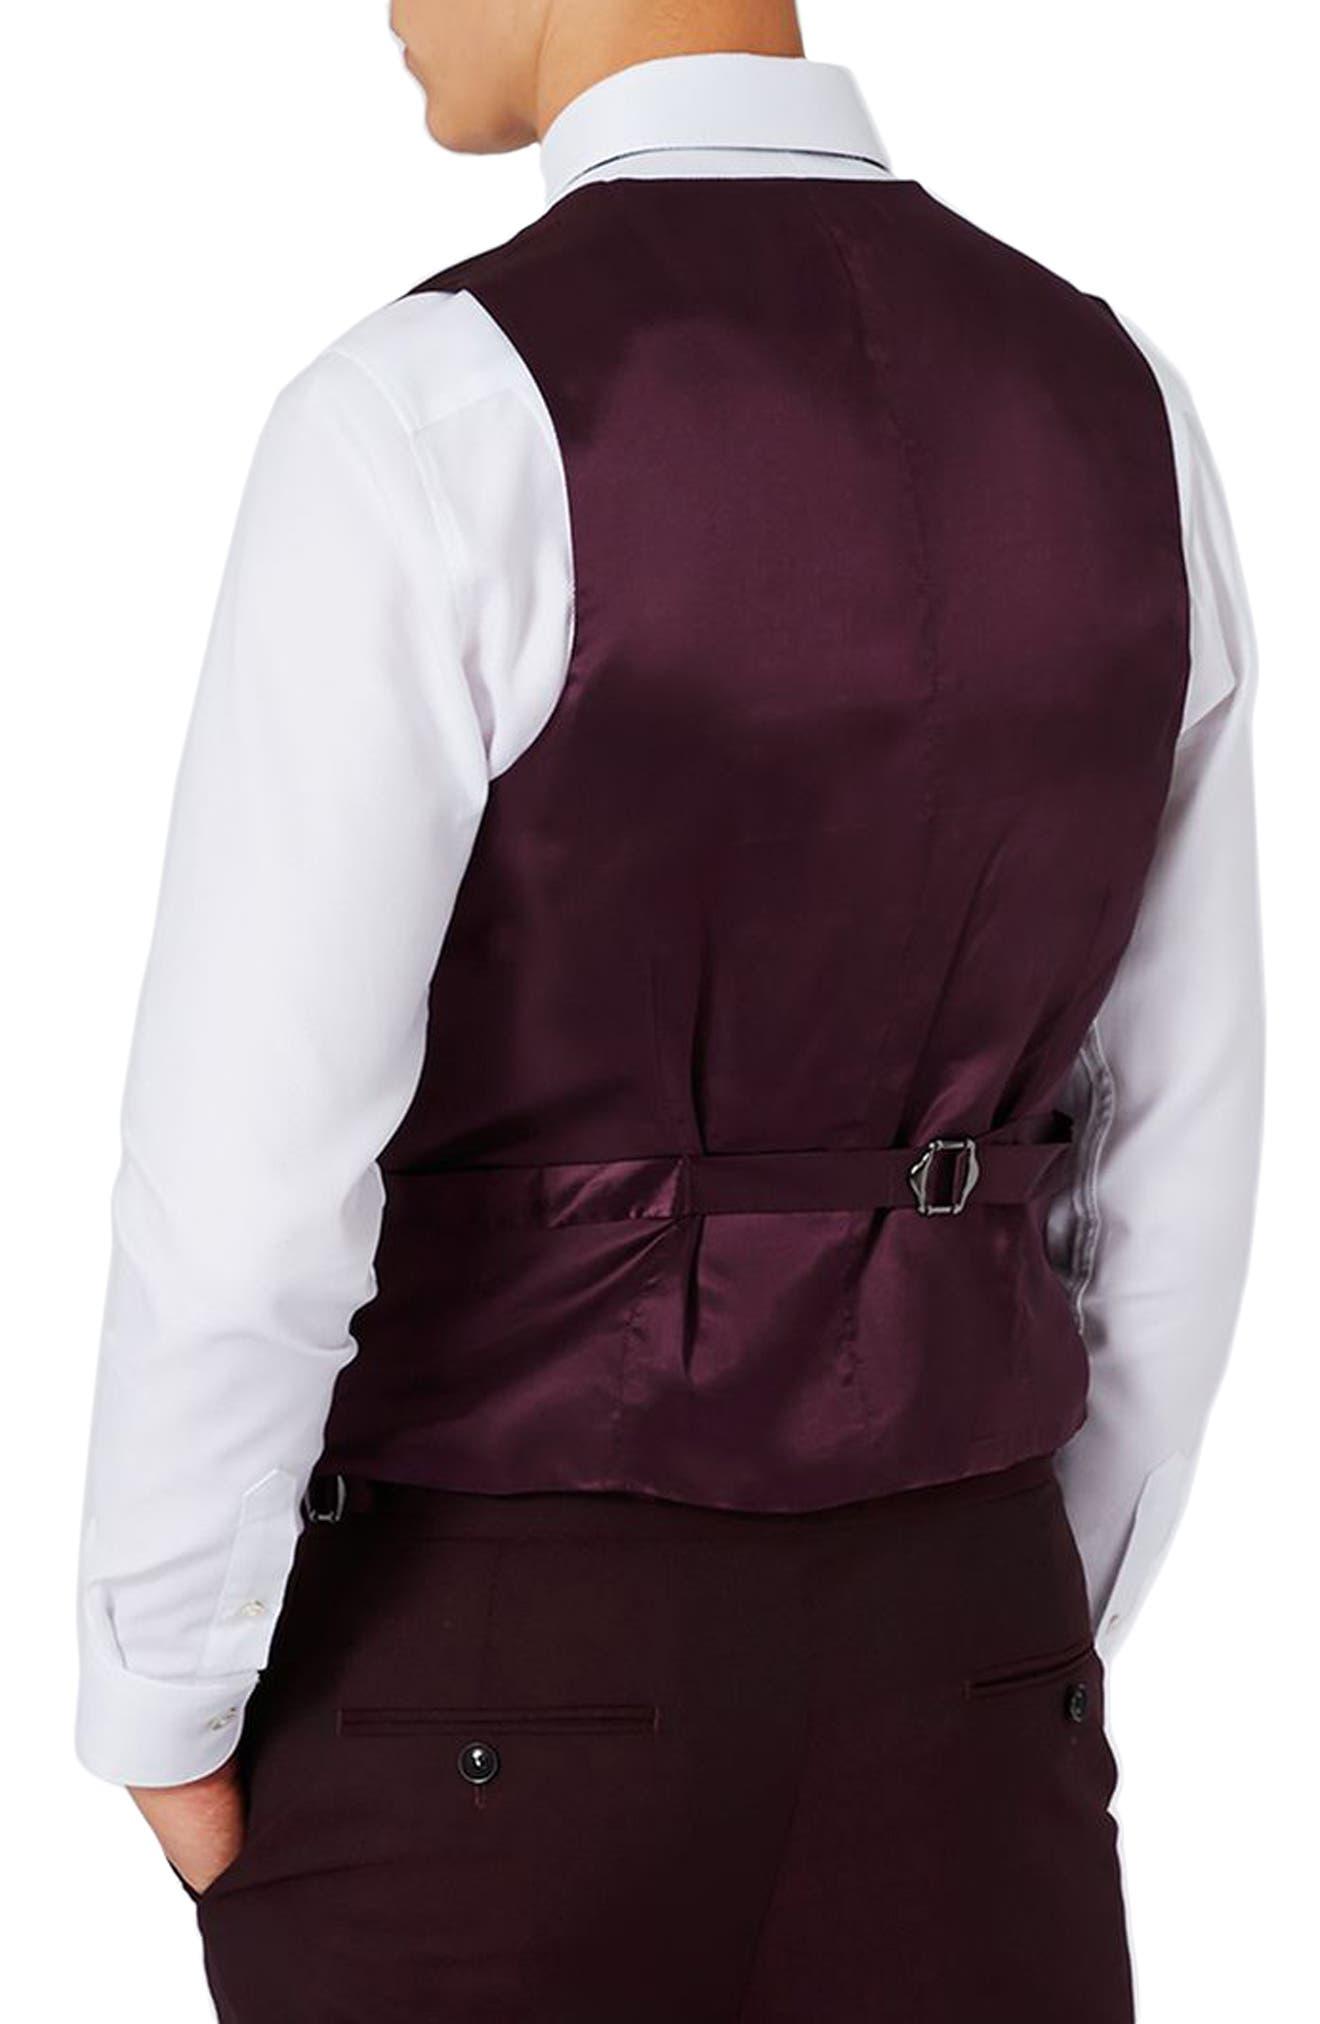 Alternate Image 3  - Charlie Casely-Hayford x Topman Skinny Fit Vest